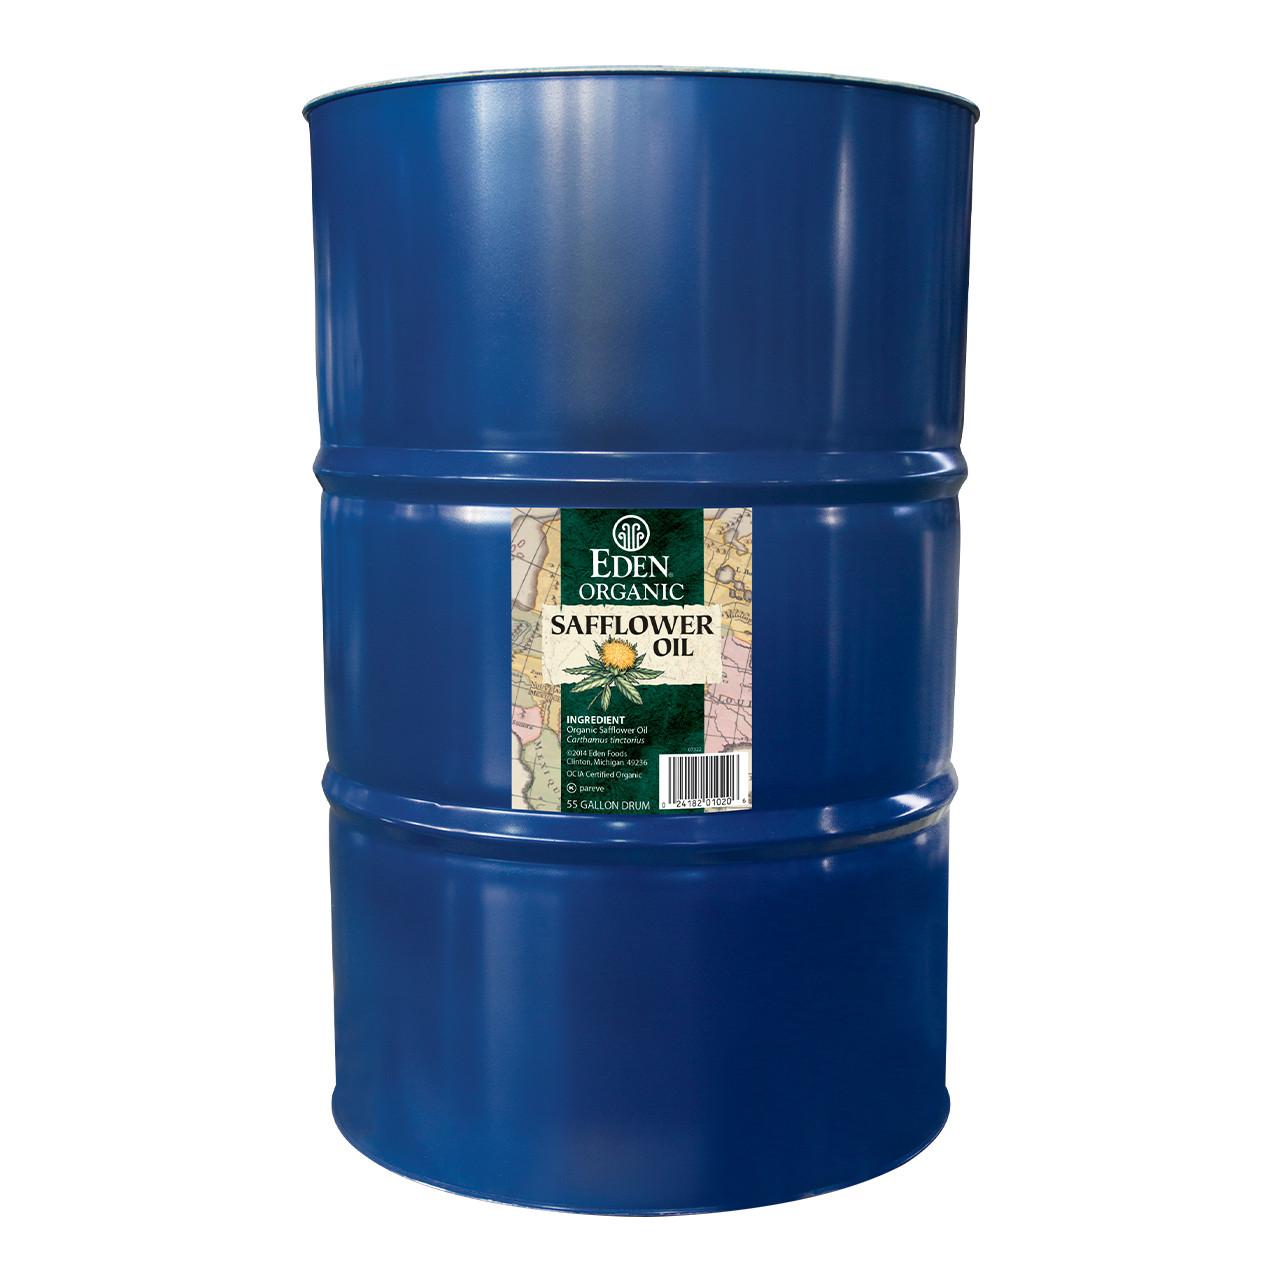 Safflower Oil - High Oleic, Organic - 55 gal